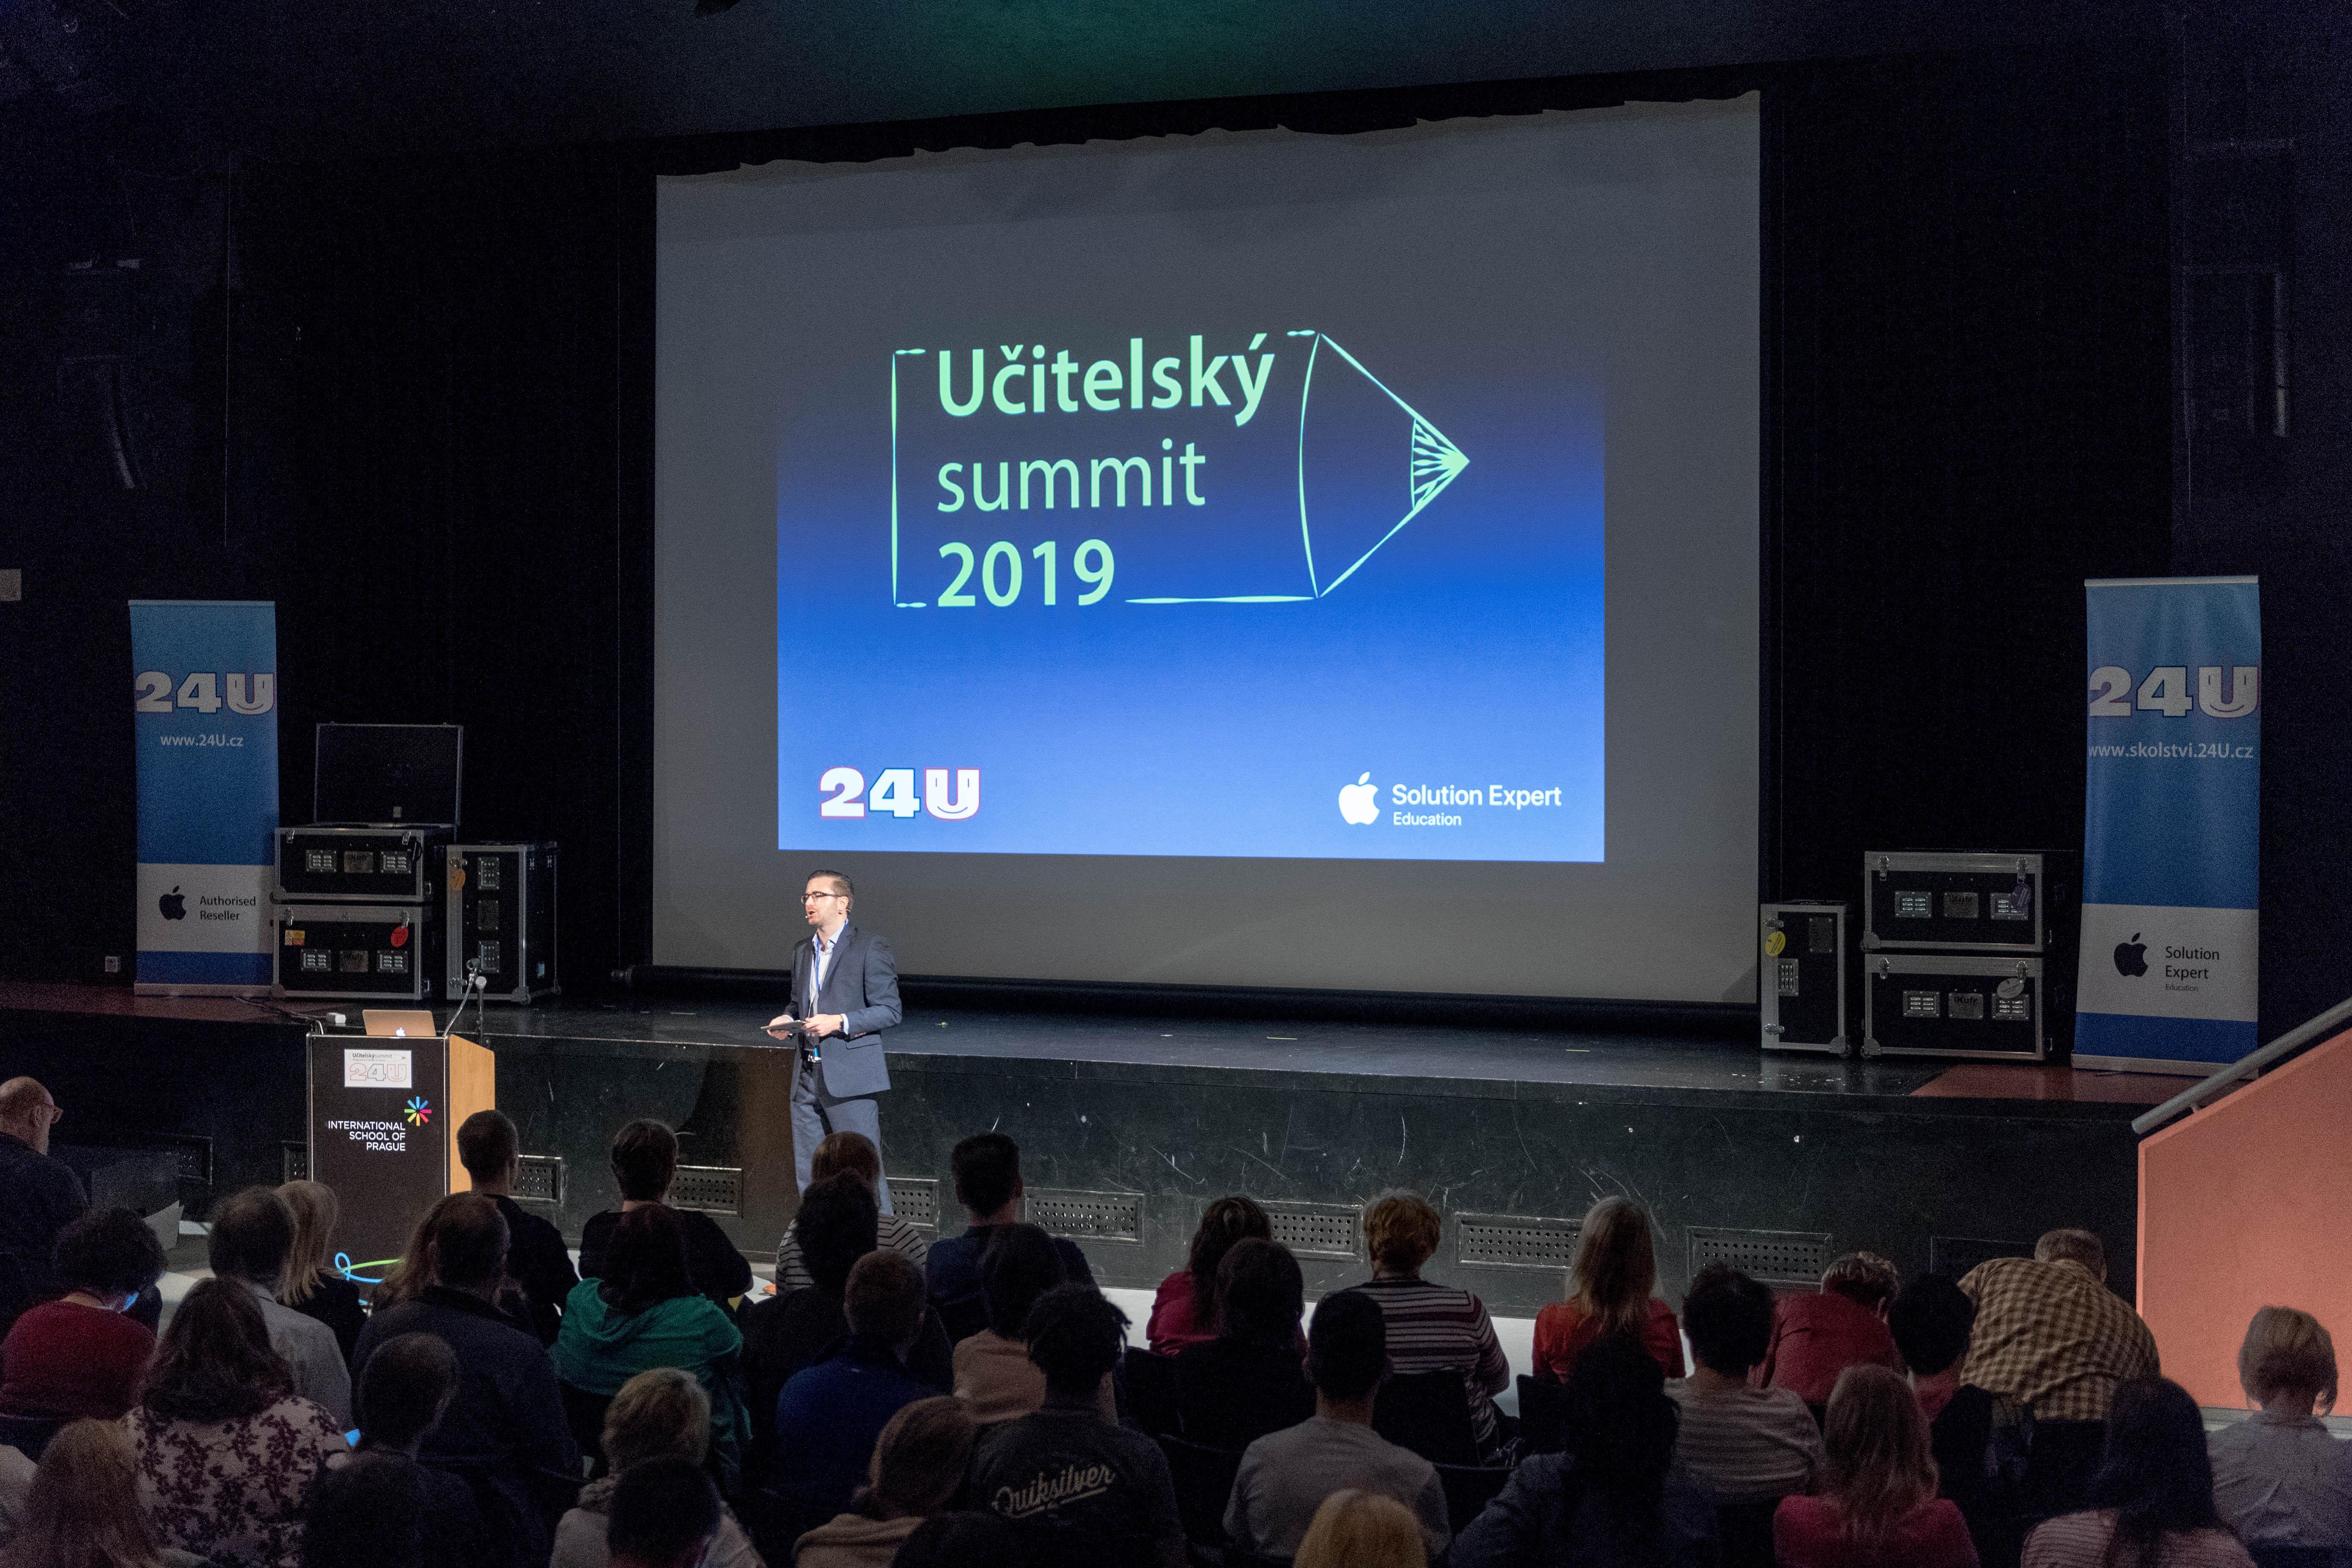 Ucitelsky summit